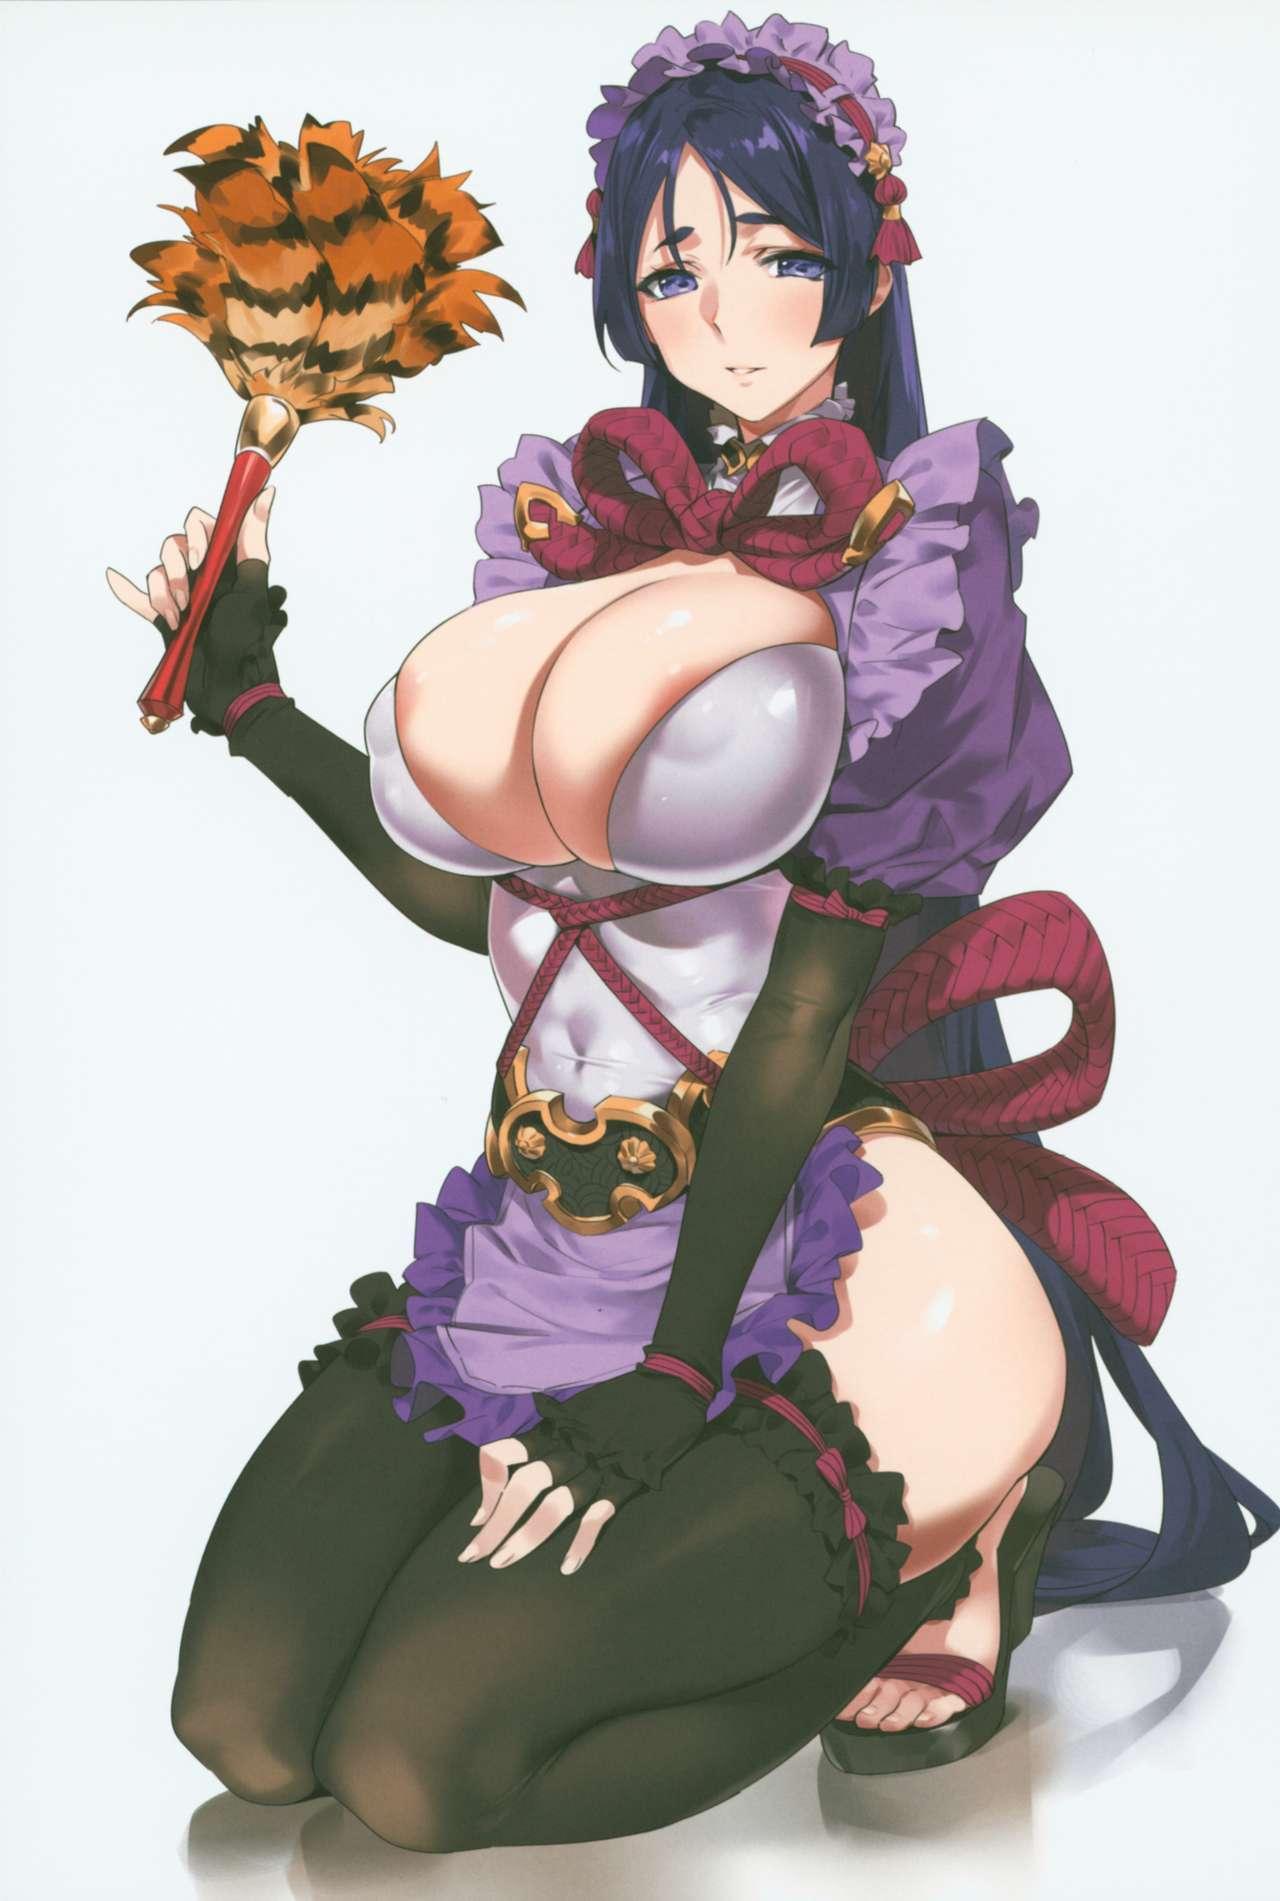 Chaldea Maid 6